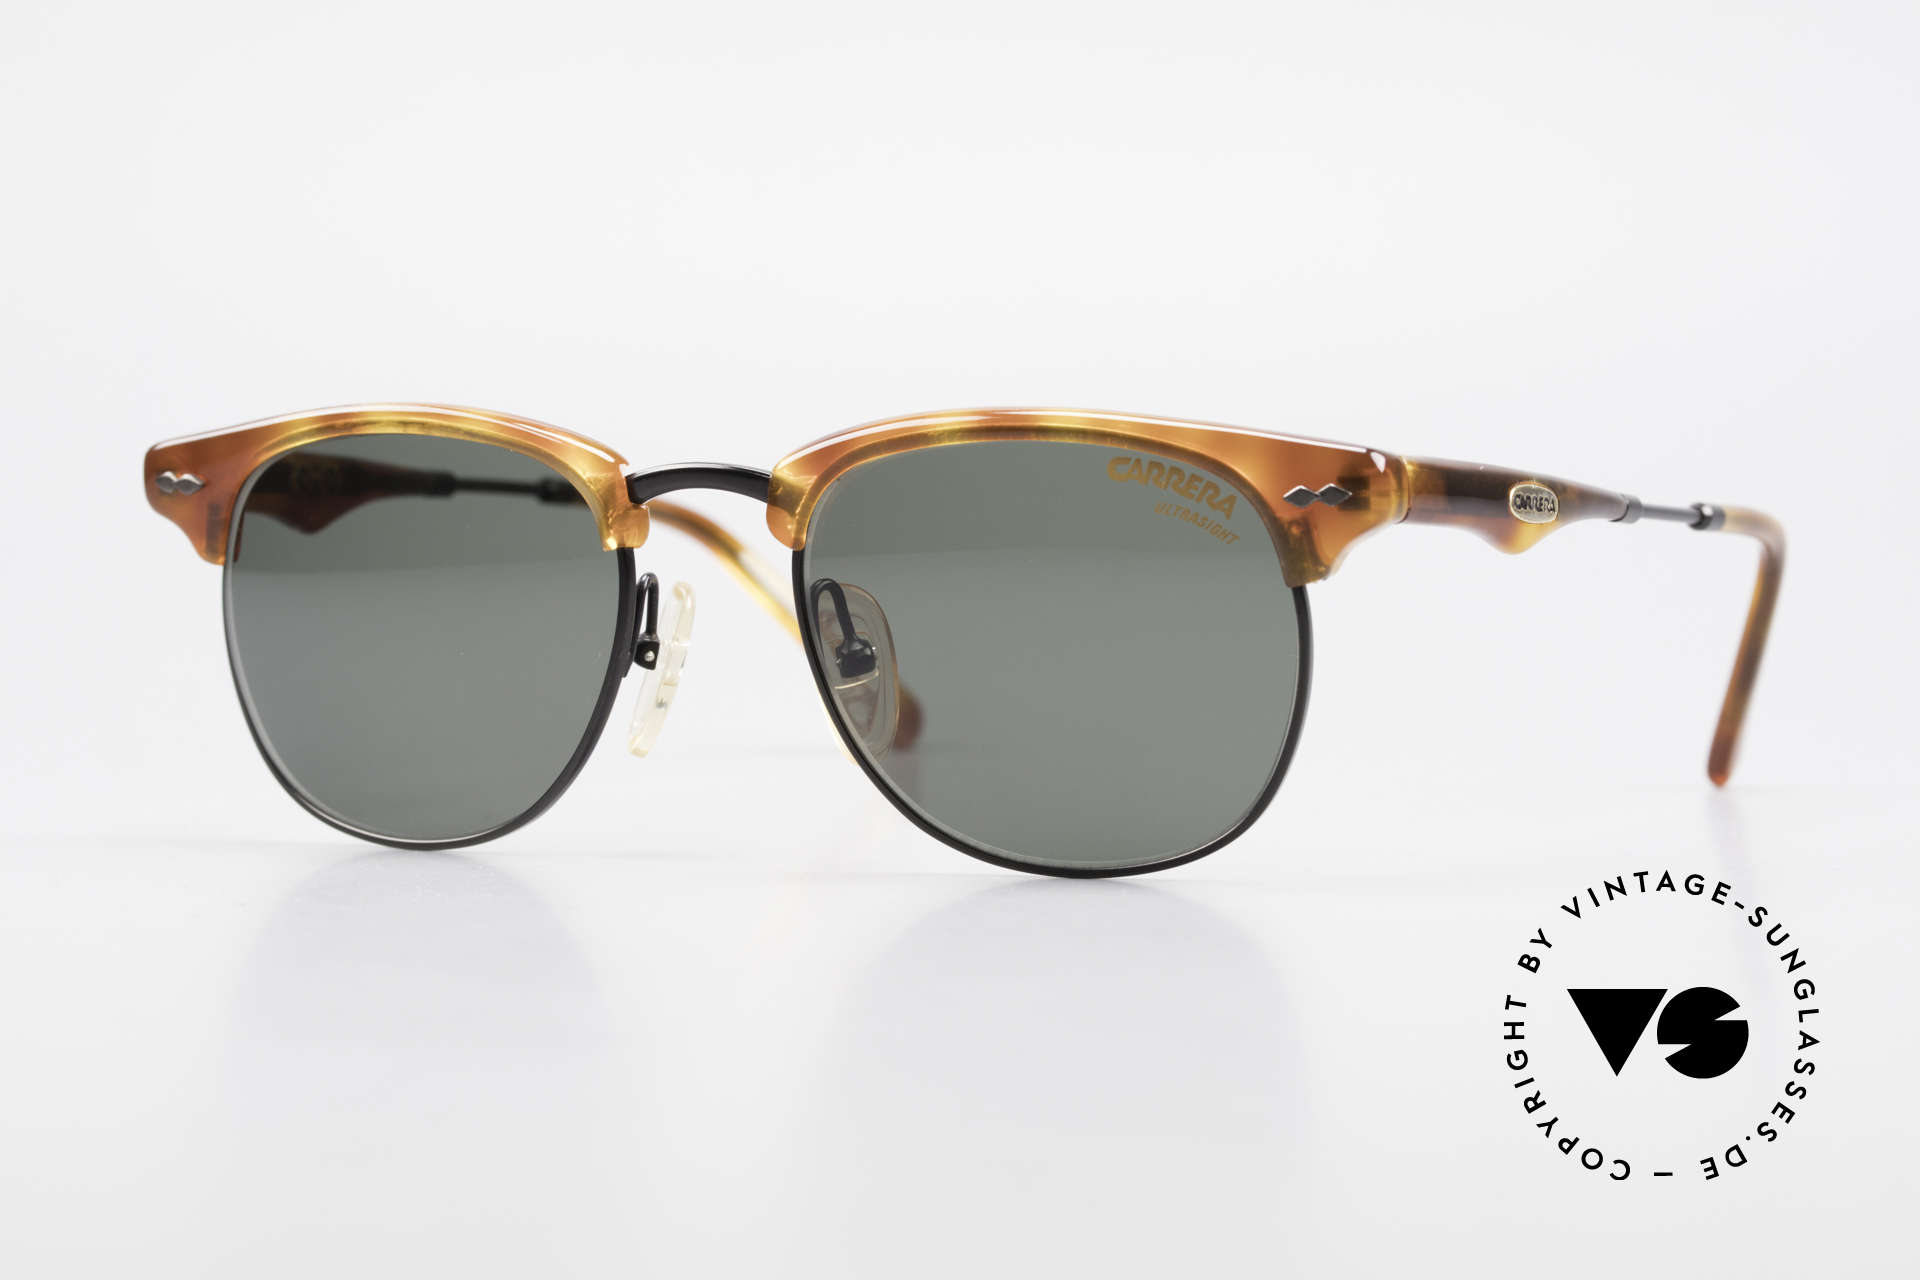 Carrera 5624 Clubmaster Shape Sunglasses, timeless vintage 90's CARRERA designer sunglasses, Made for Men